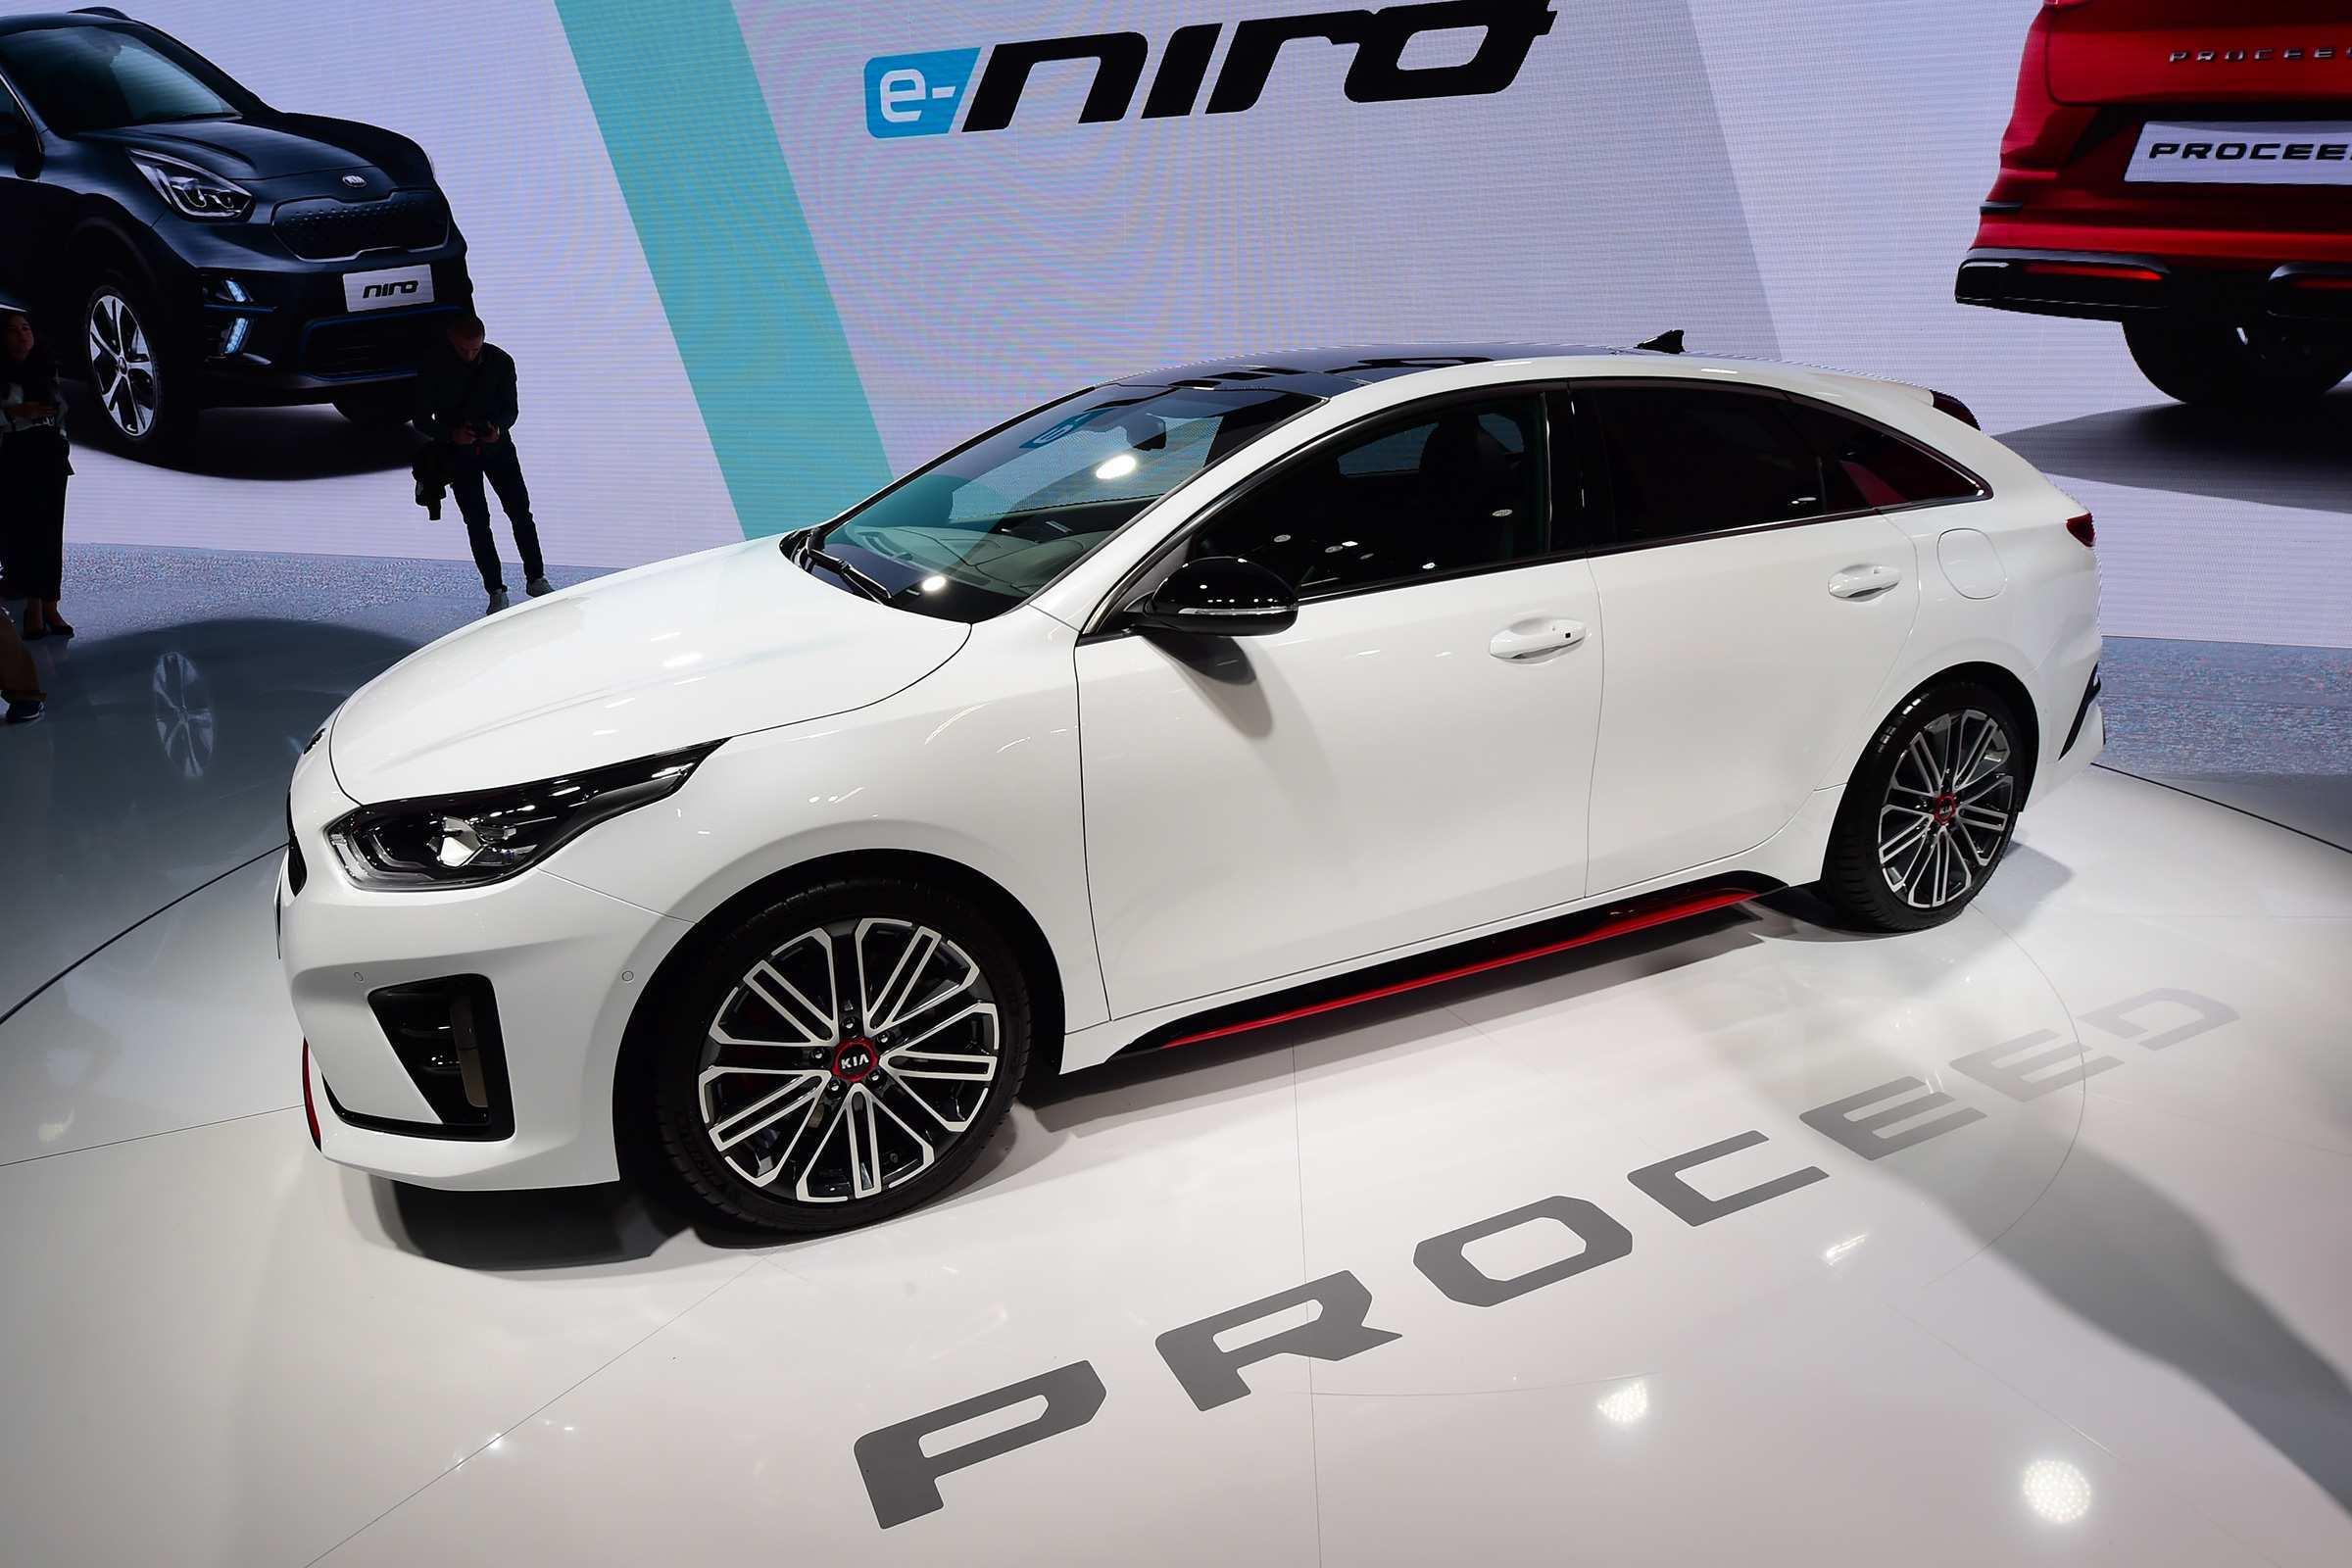 71 New Kia Pro Ceed Gt 2019 Specs for Kia Pro Ceed Gt 2019